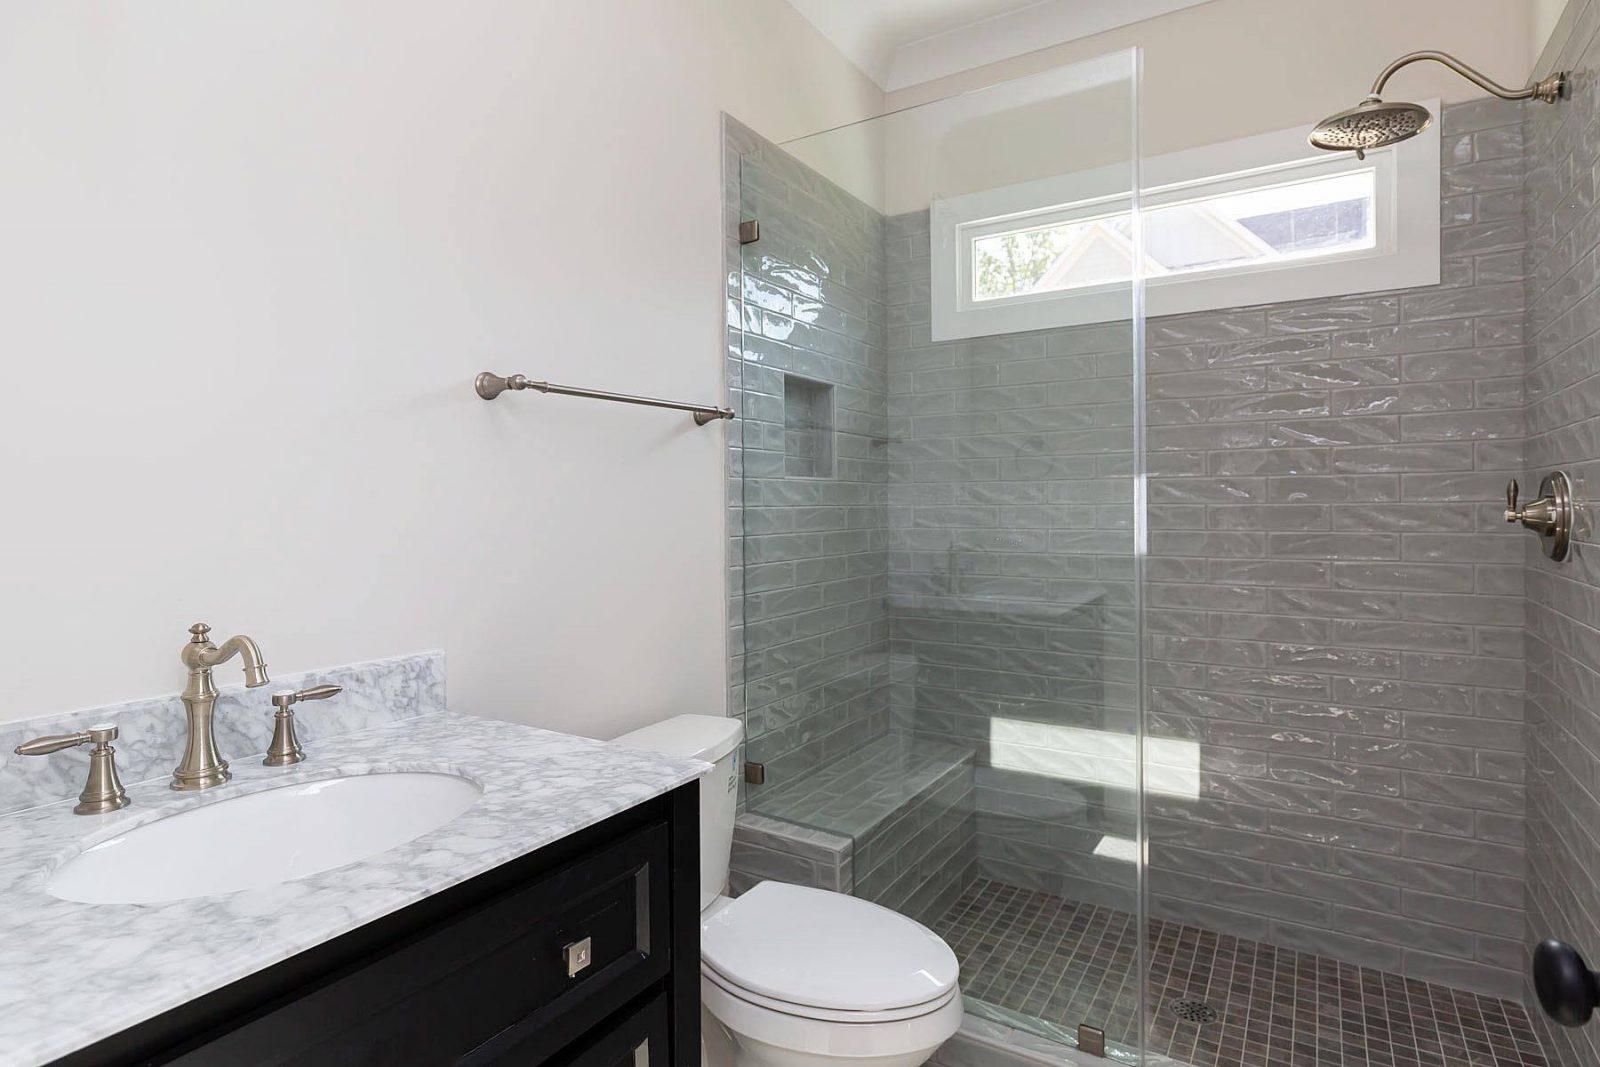 Bathroom interior | Frazee Carpet & Flooring